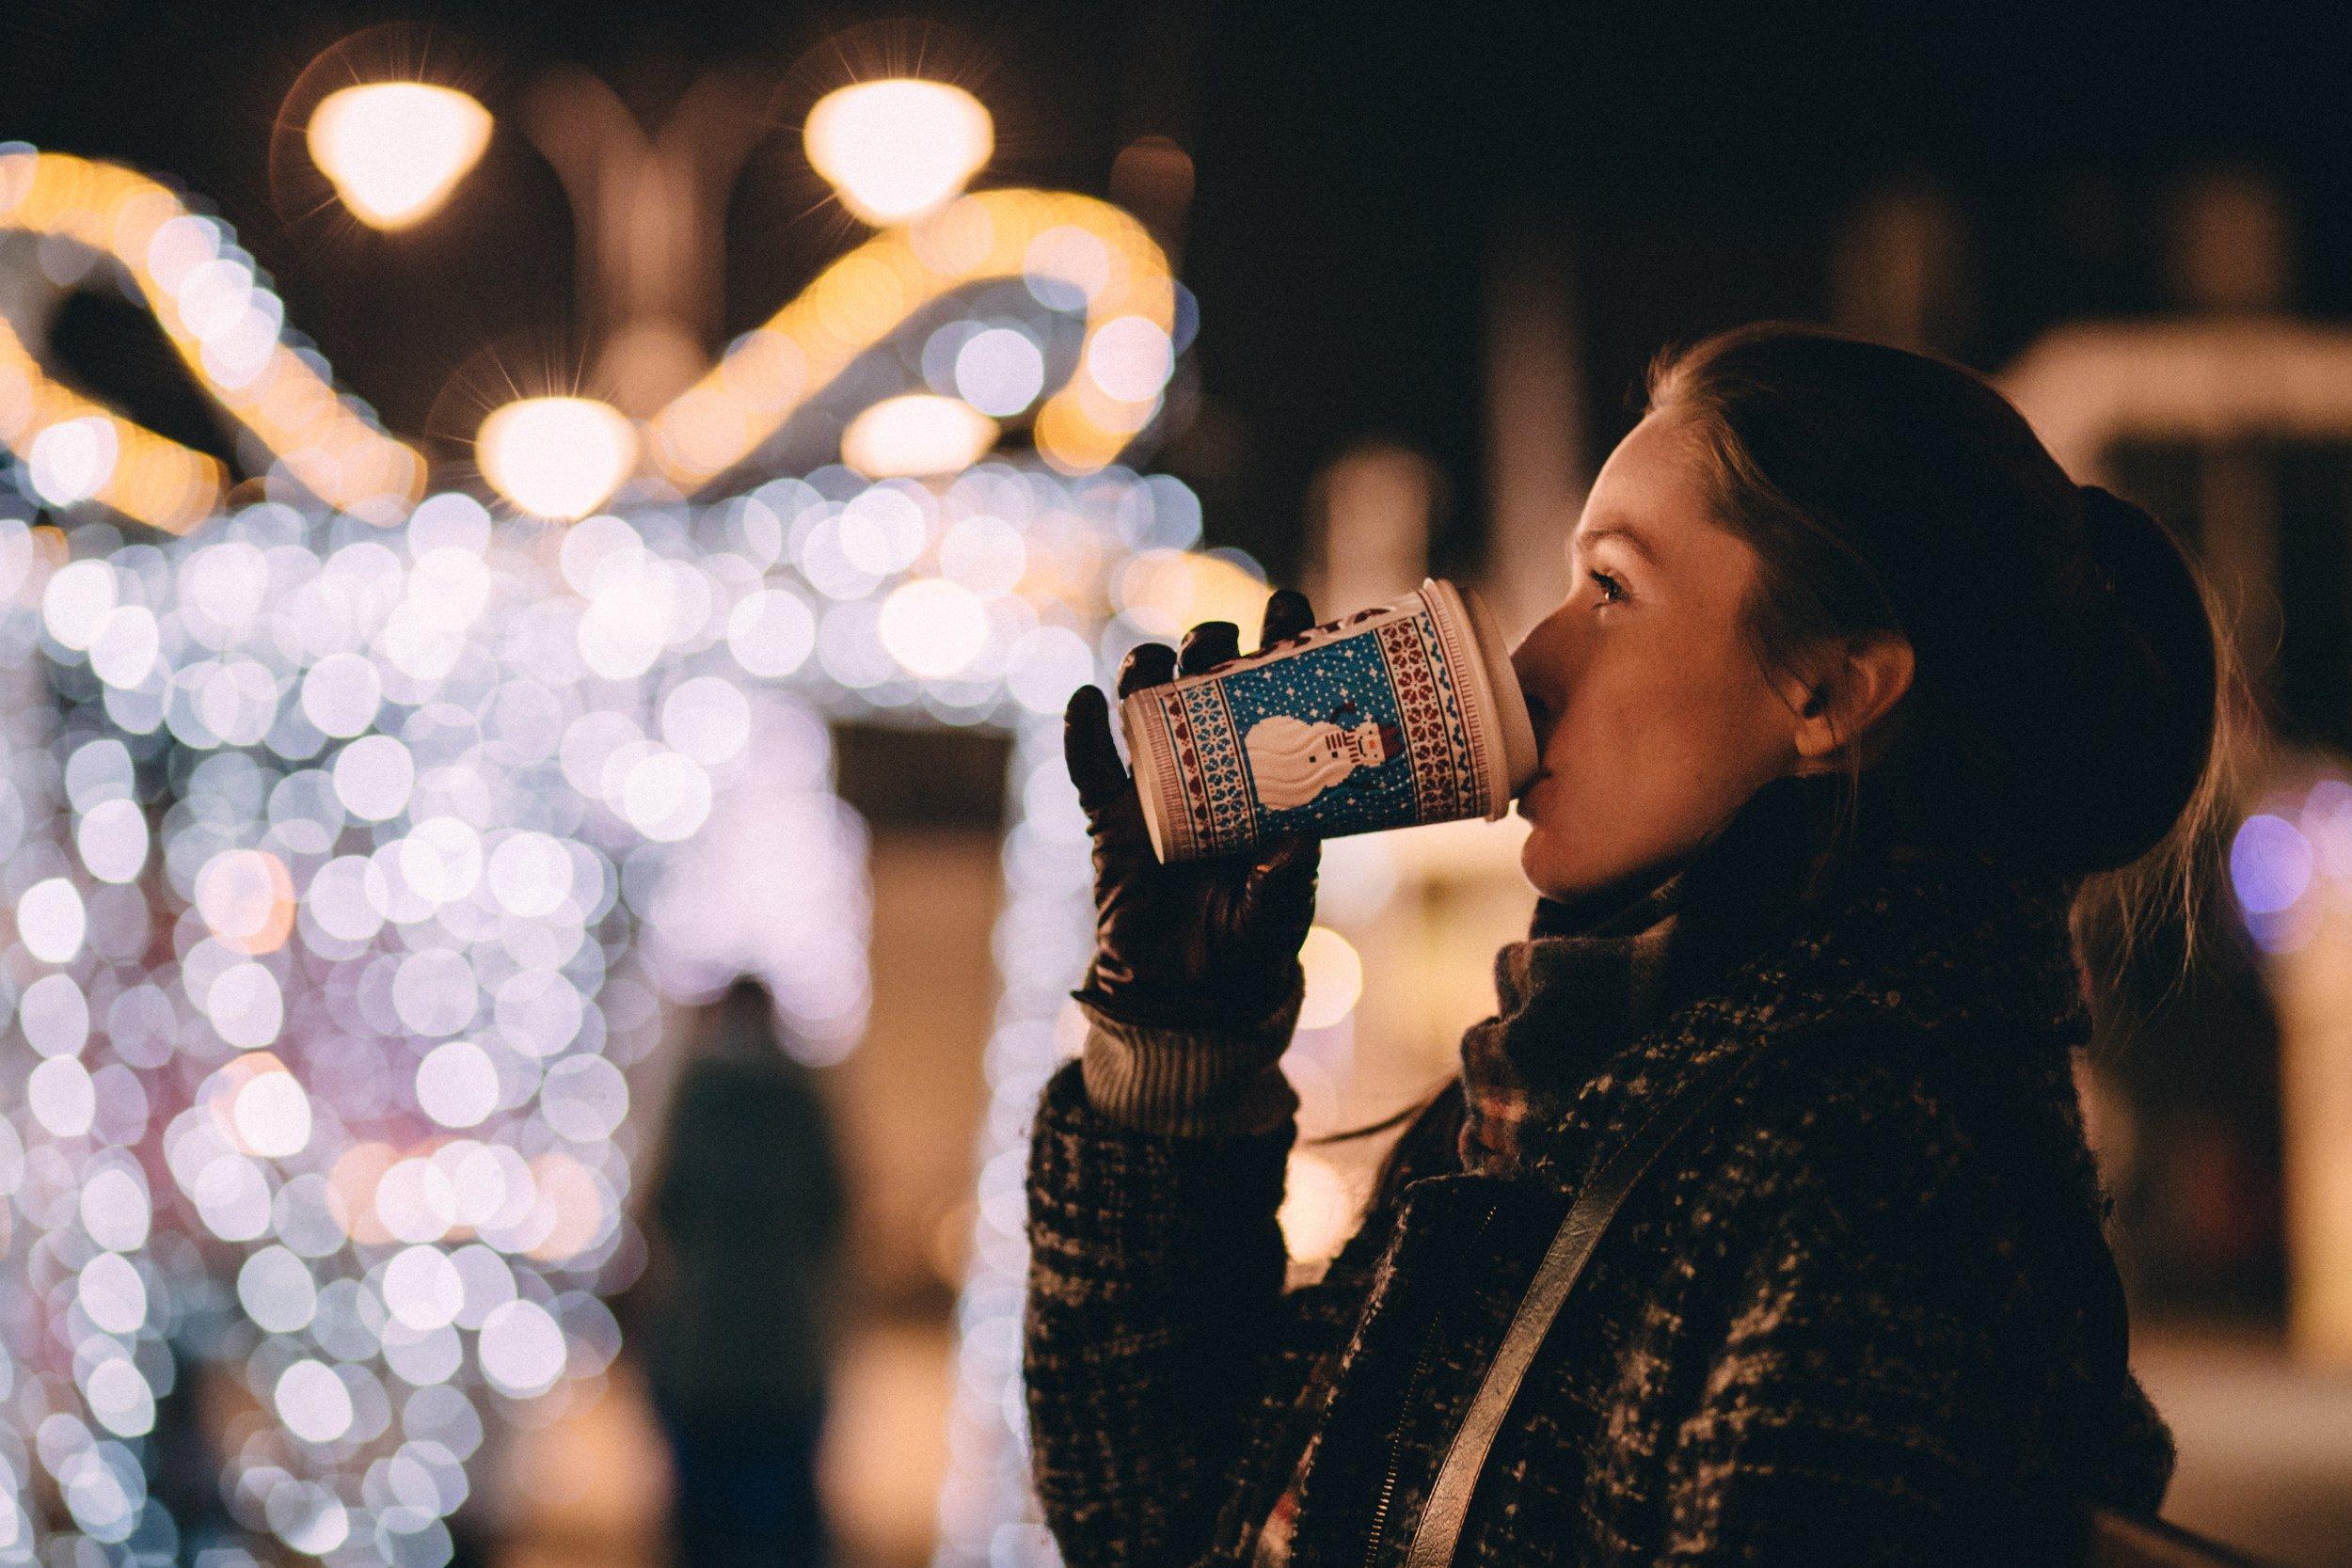 Photo by  freestocks.org  on  Unsplash